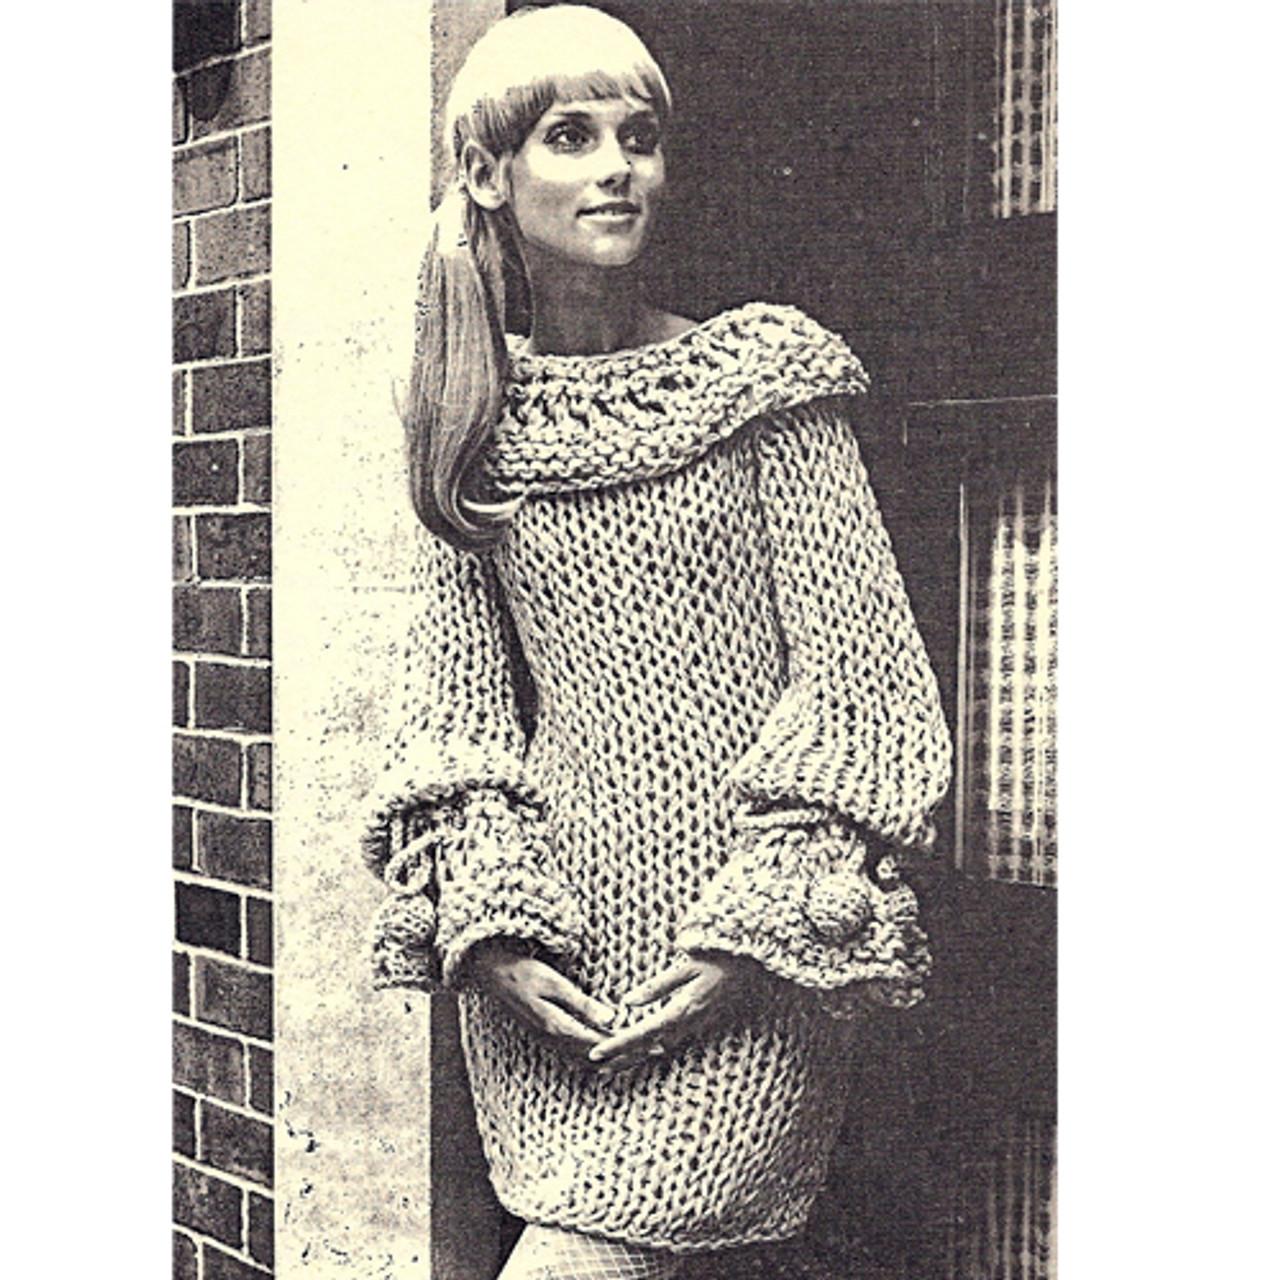 Vintage Cape Collared Mini Dress Pattern on Big Needles